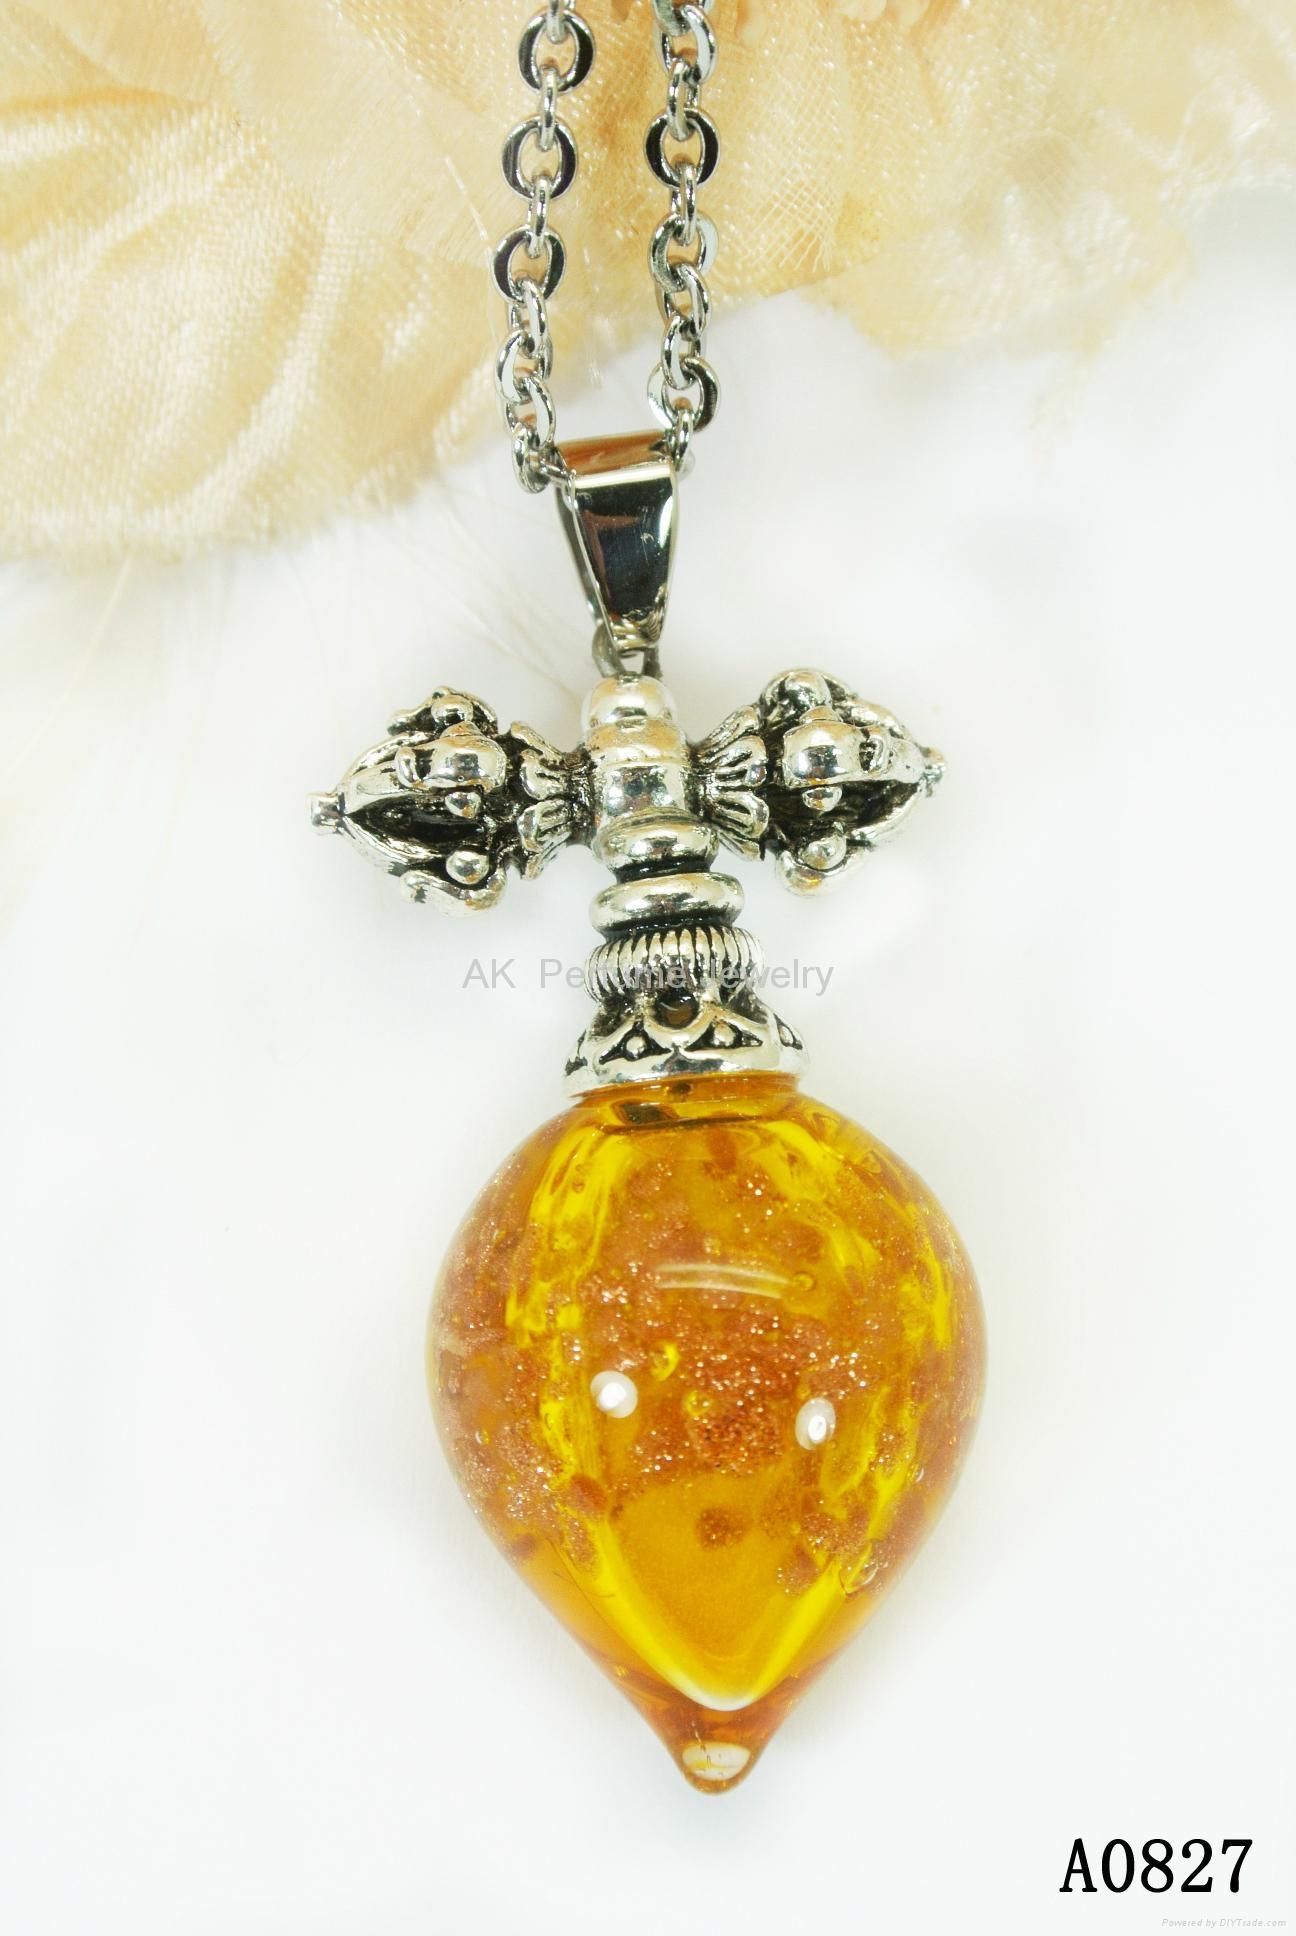 AK~香氛珠宝琉璃精油瓶项链时尚精品毛衣吊坠『金刚杵』 6